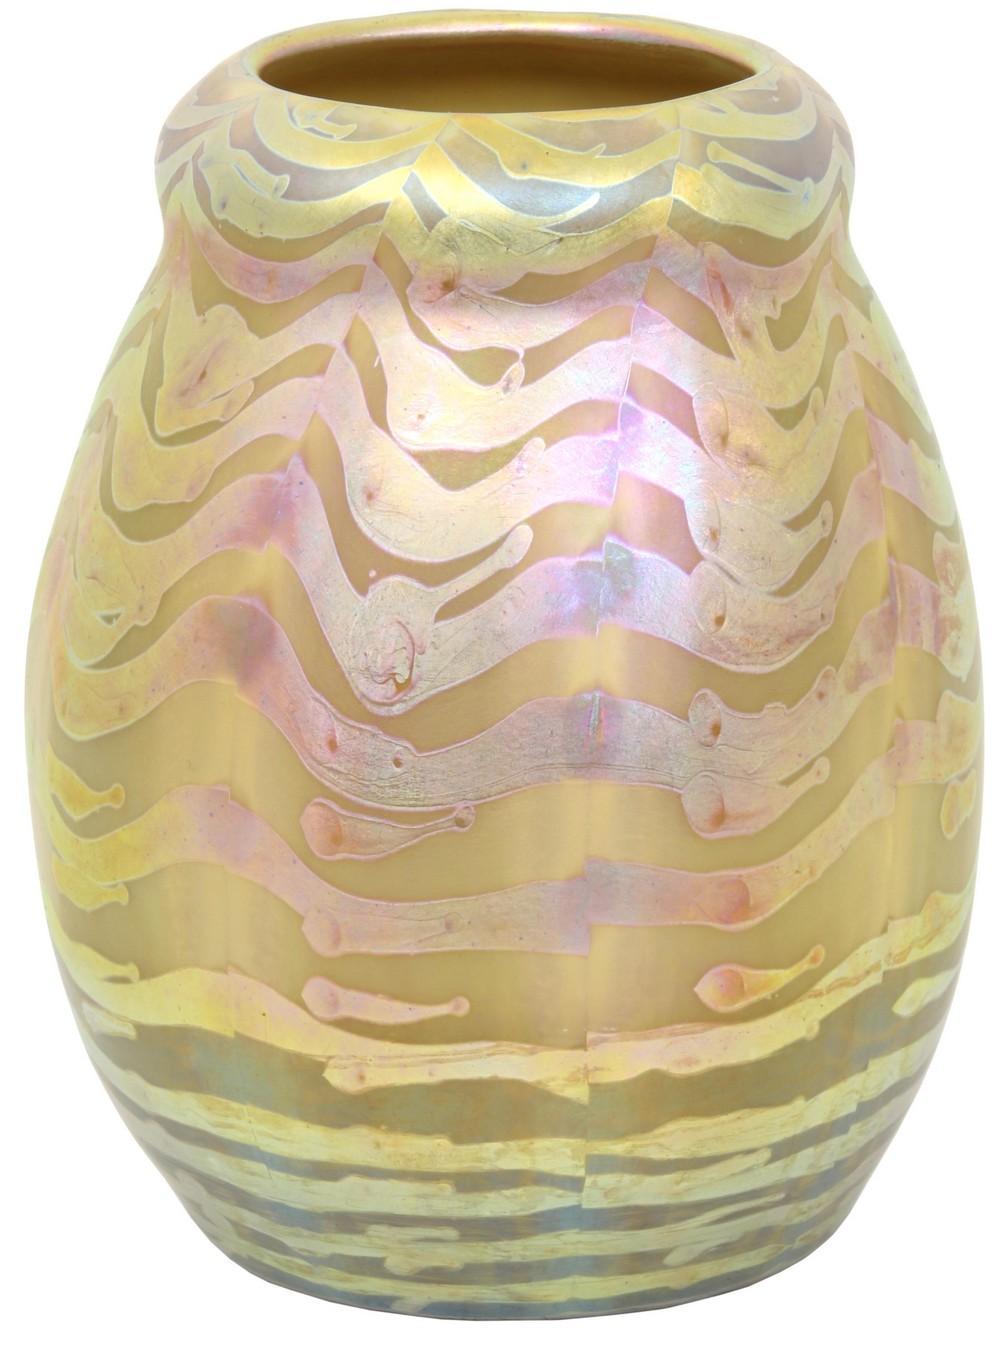 Trevaise Decorated Art Glass Vase